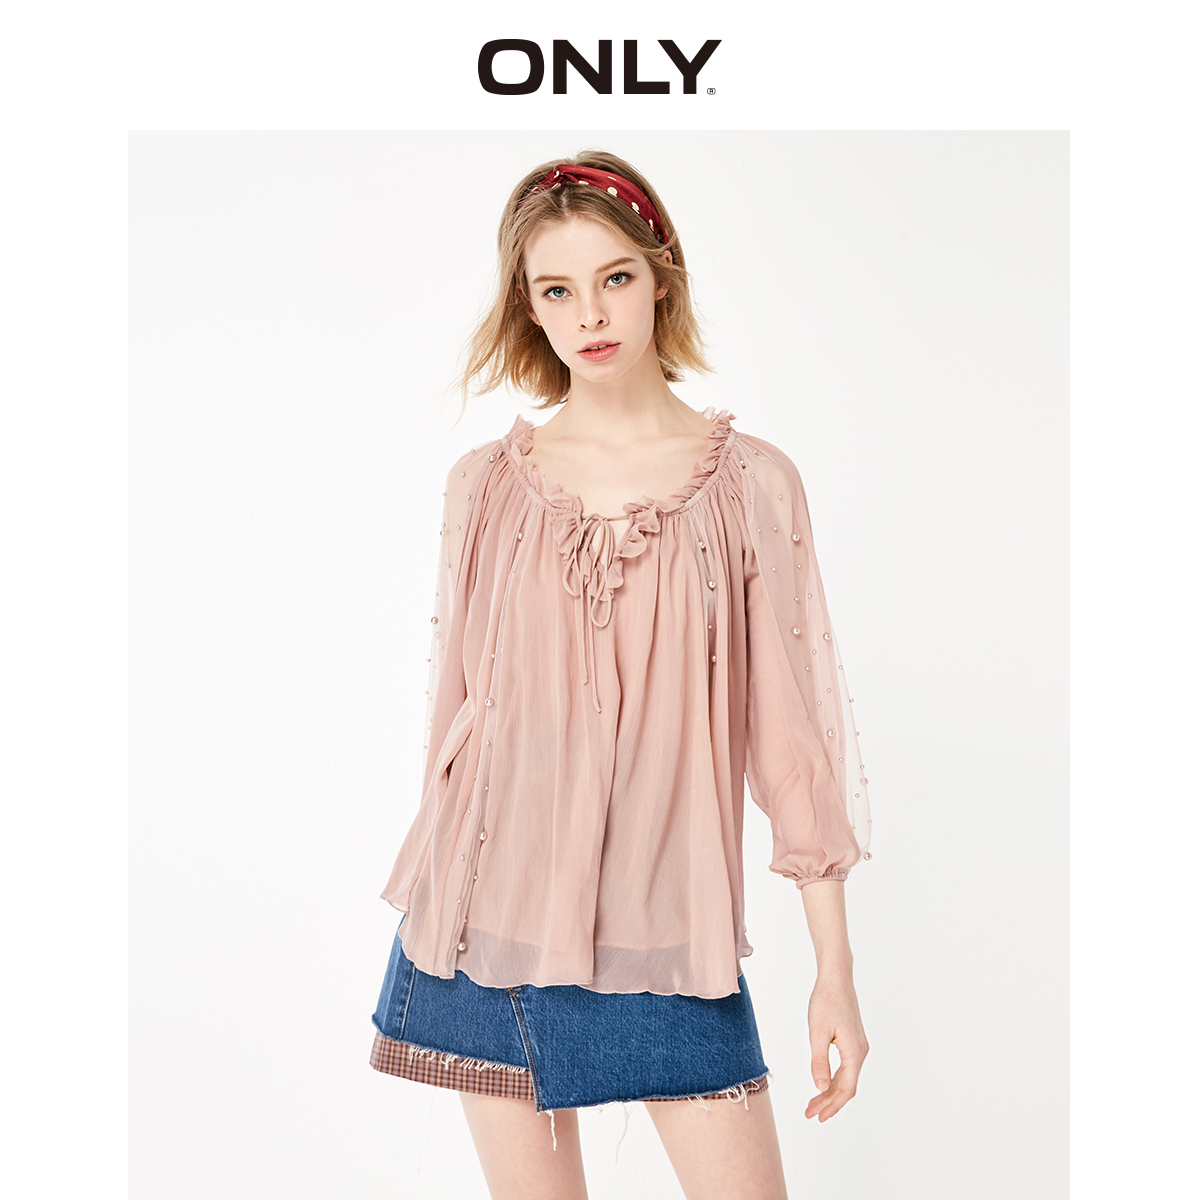 ONLY Women's Loose Fit Gauzy Lace-up Chiffon Shirt   119151535